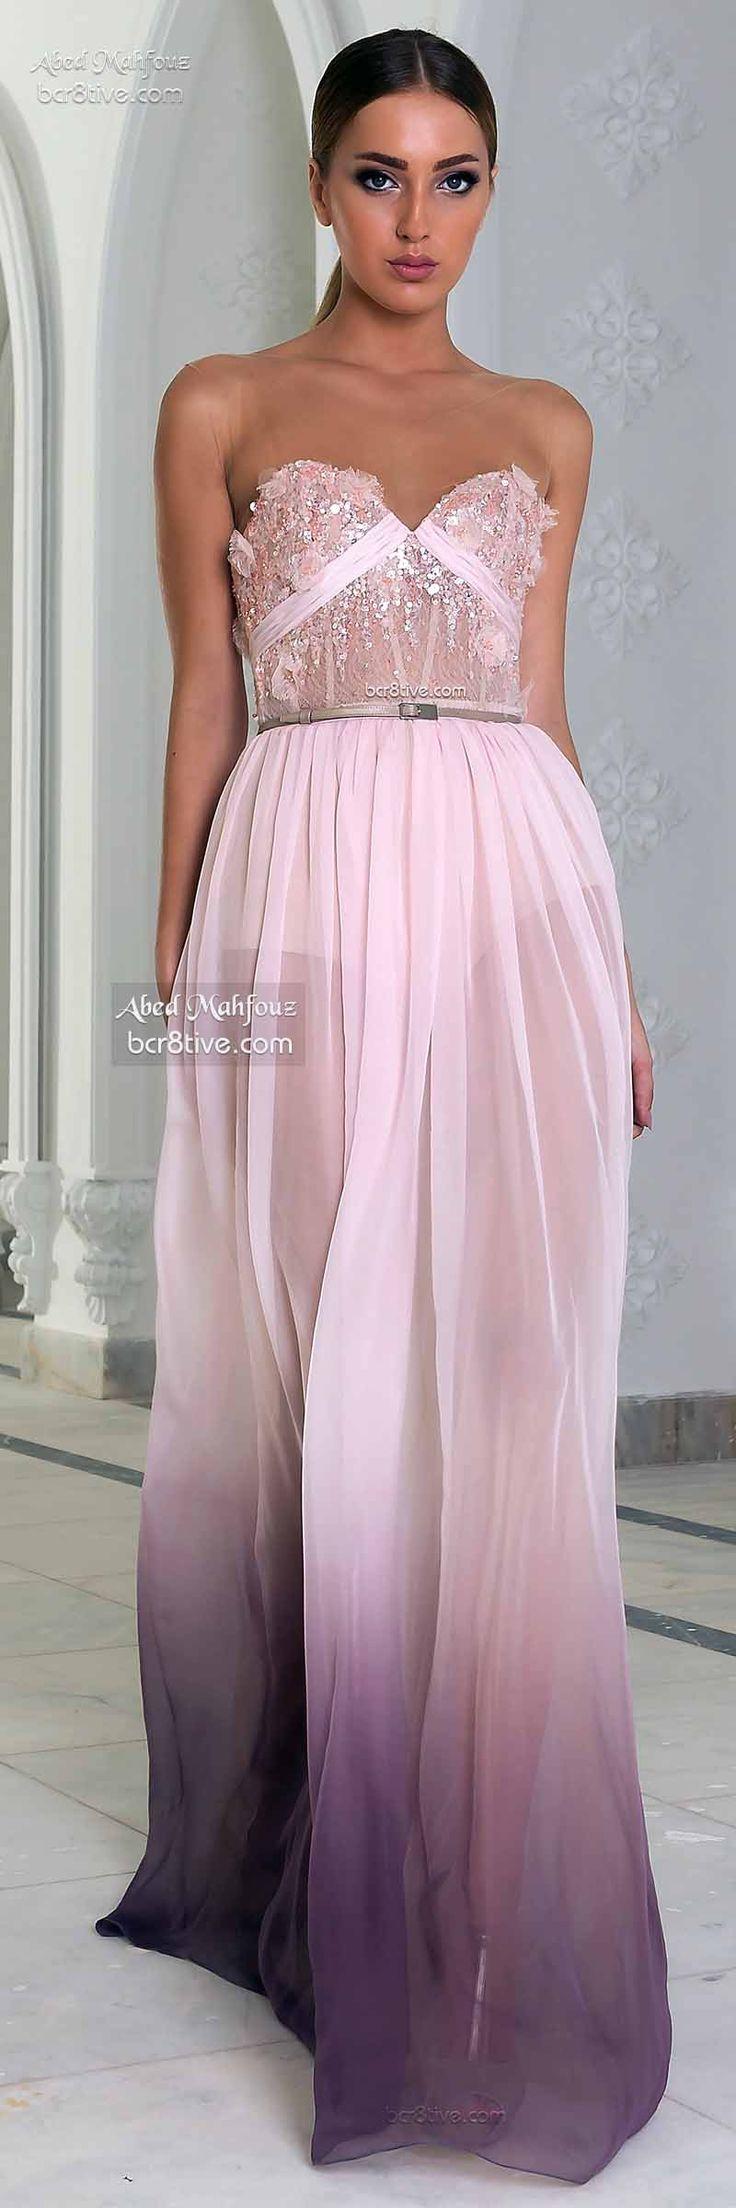 Mejores 458 imágenes de Gowns en Pinterest | Trajes de fiesta ...